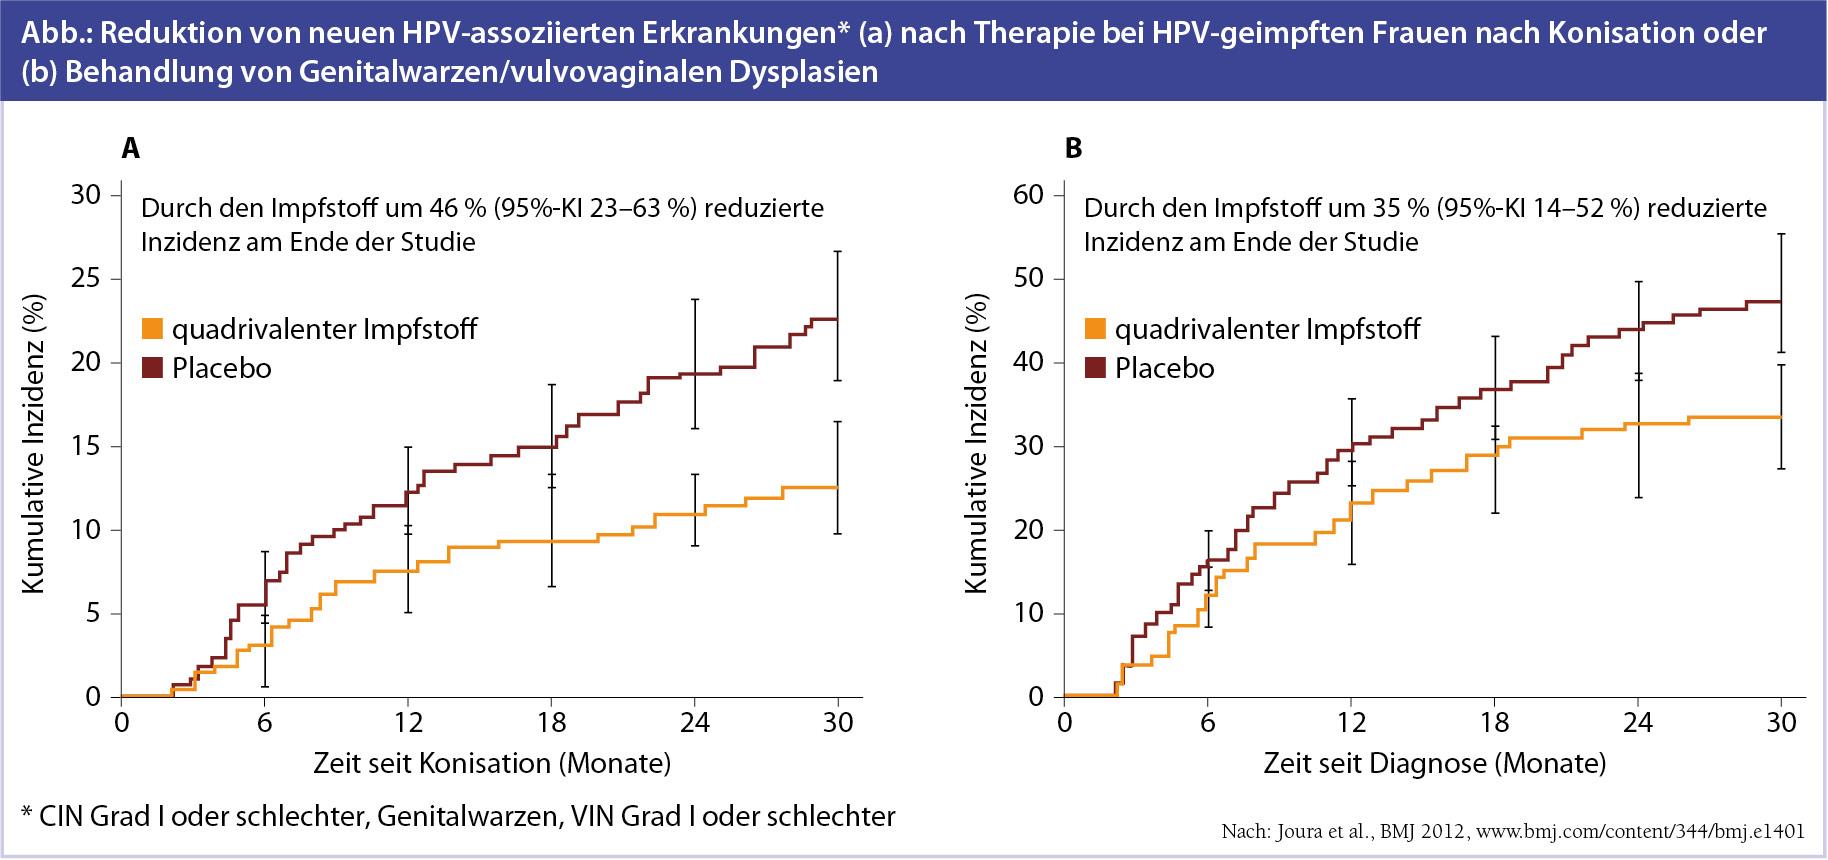 HPV immunfokozók